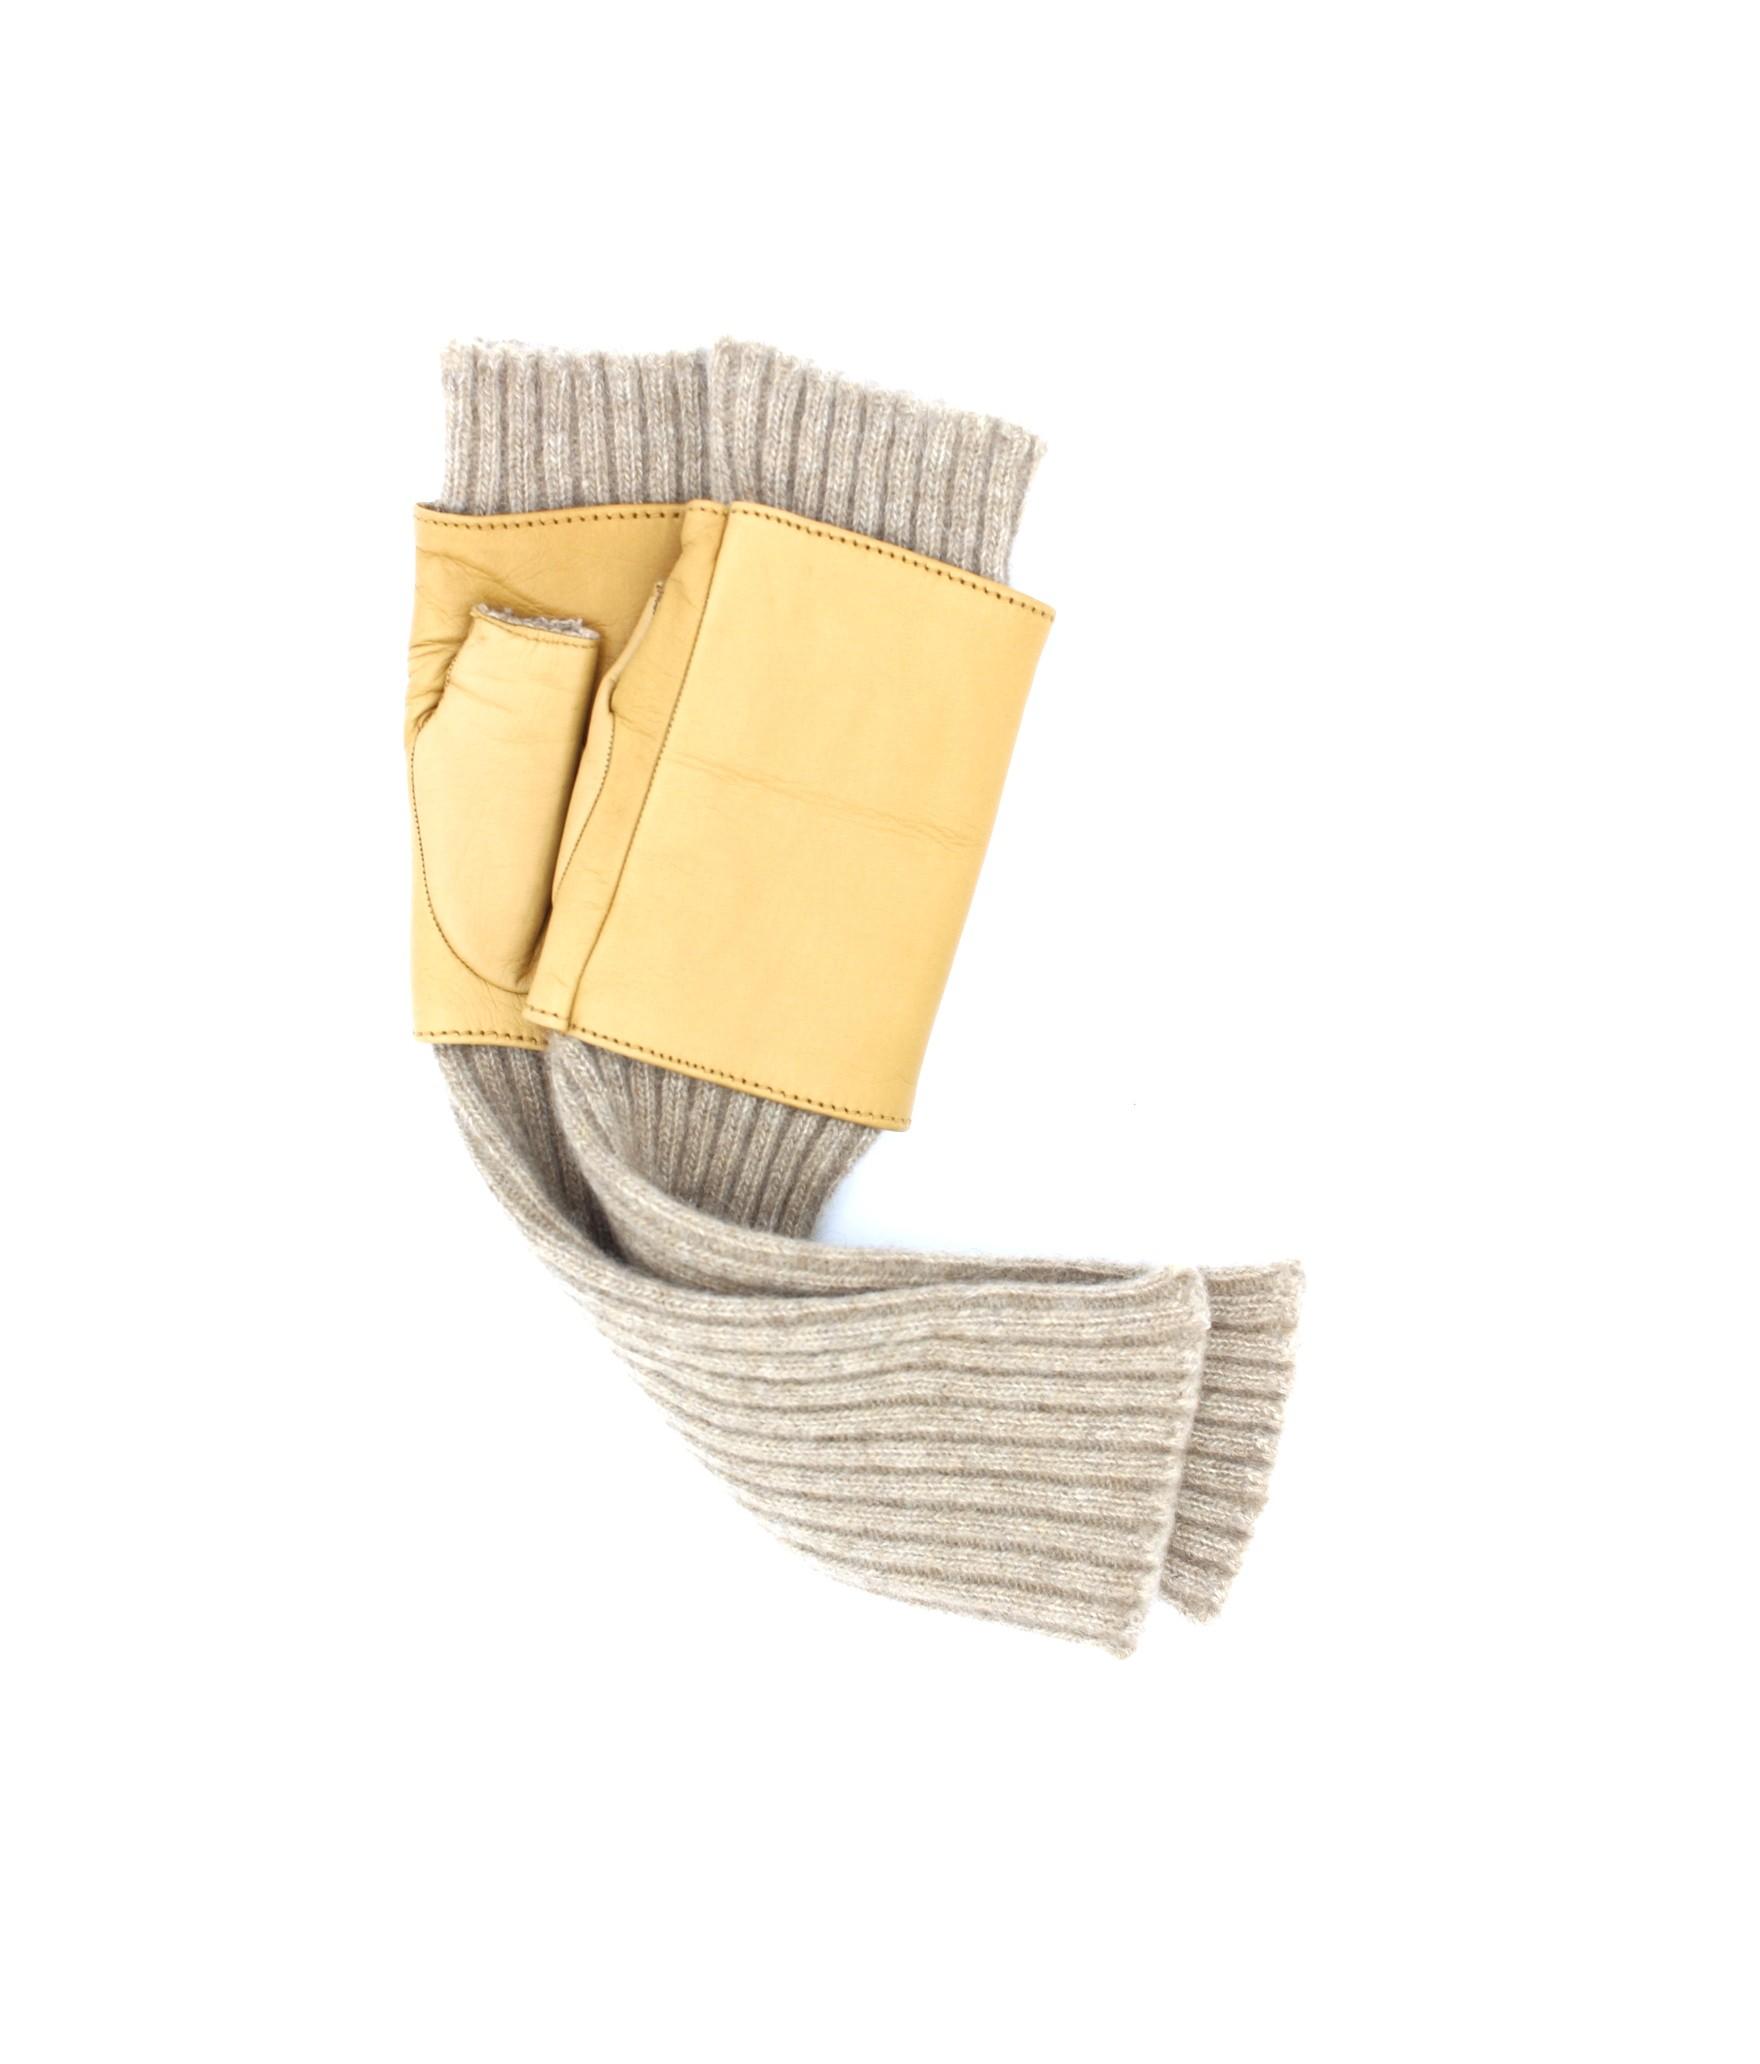 Half Mitten in Nappa leather and cashmere 8bt Camel Sermoneta